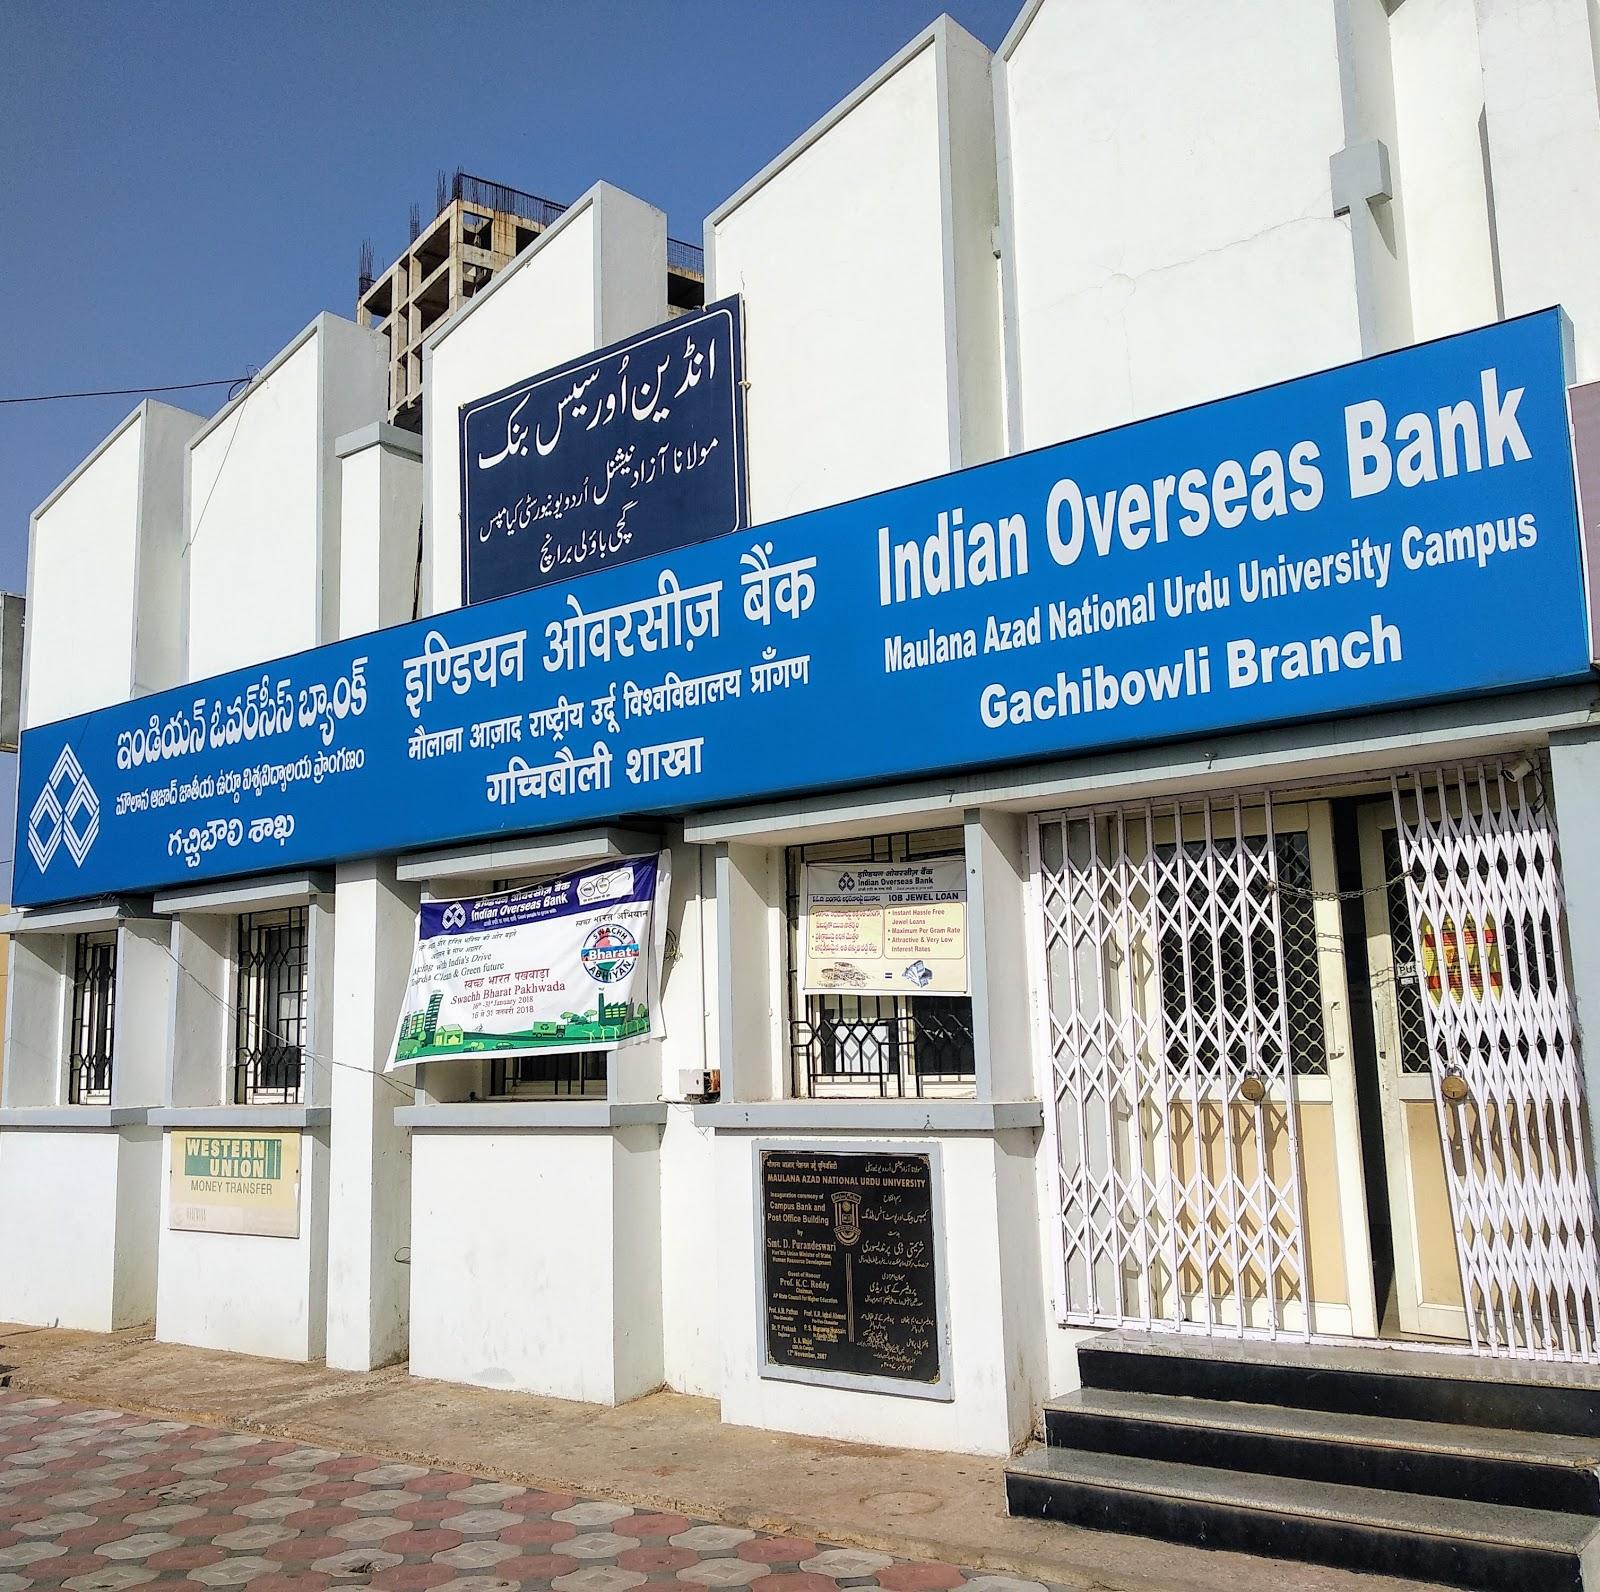 blood bank Indian Overseas Bank near Hyderabad Telangana